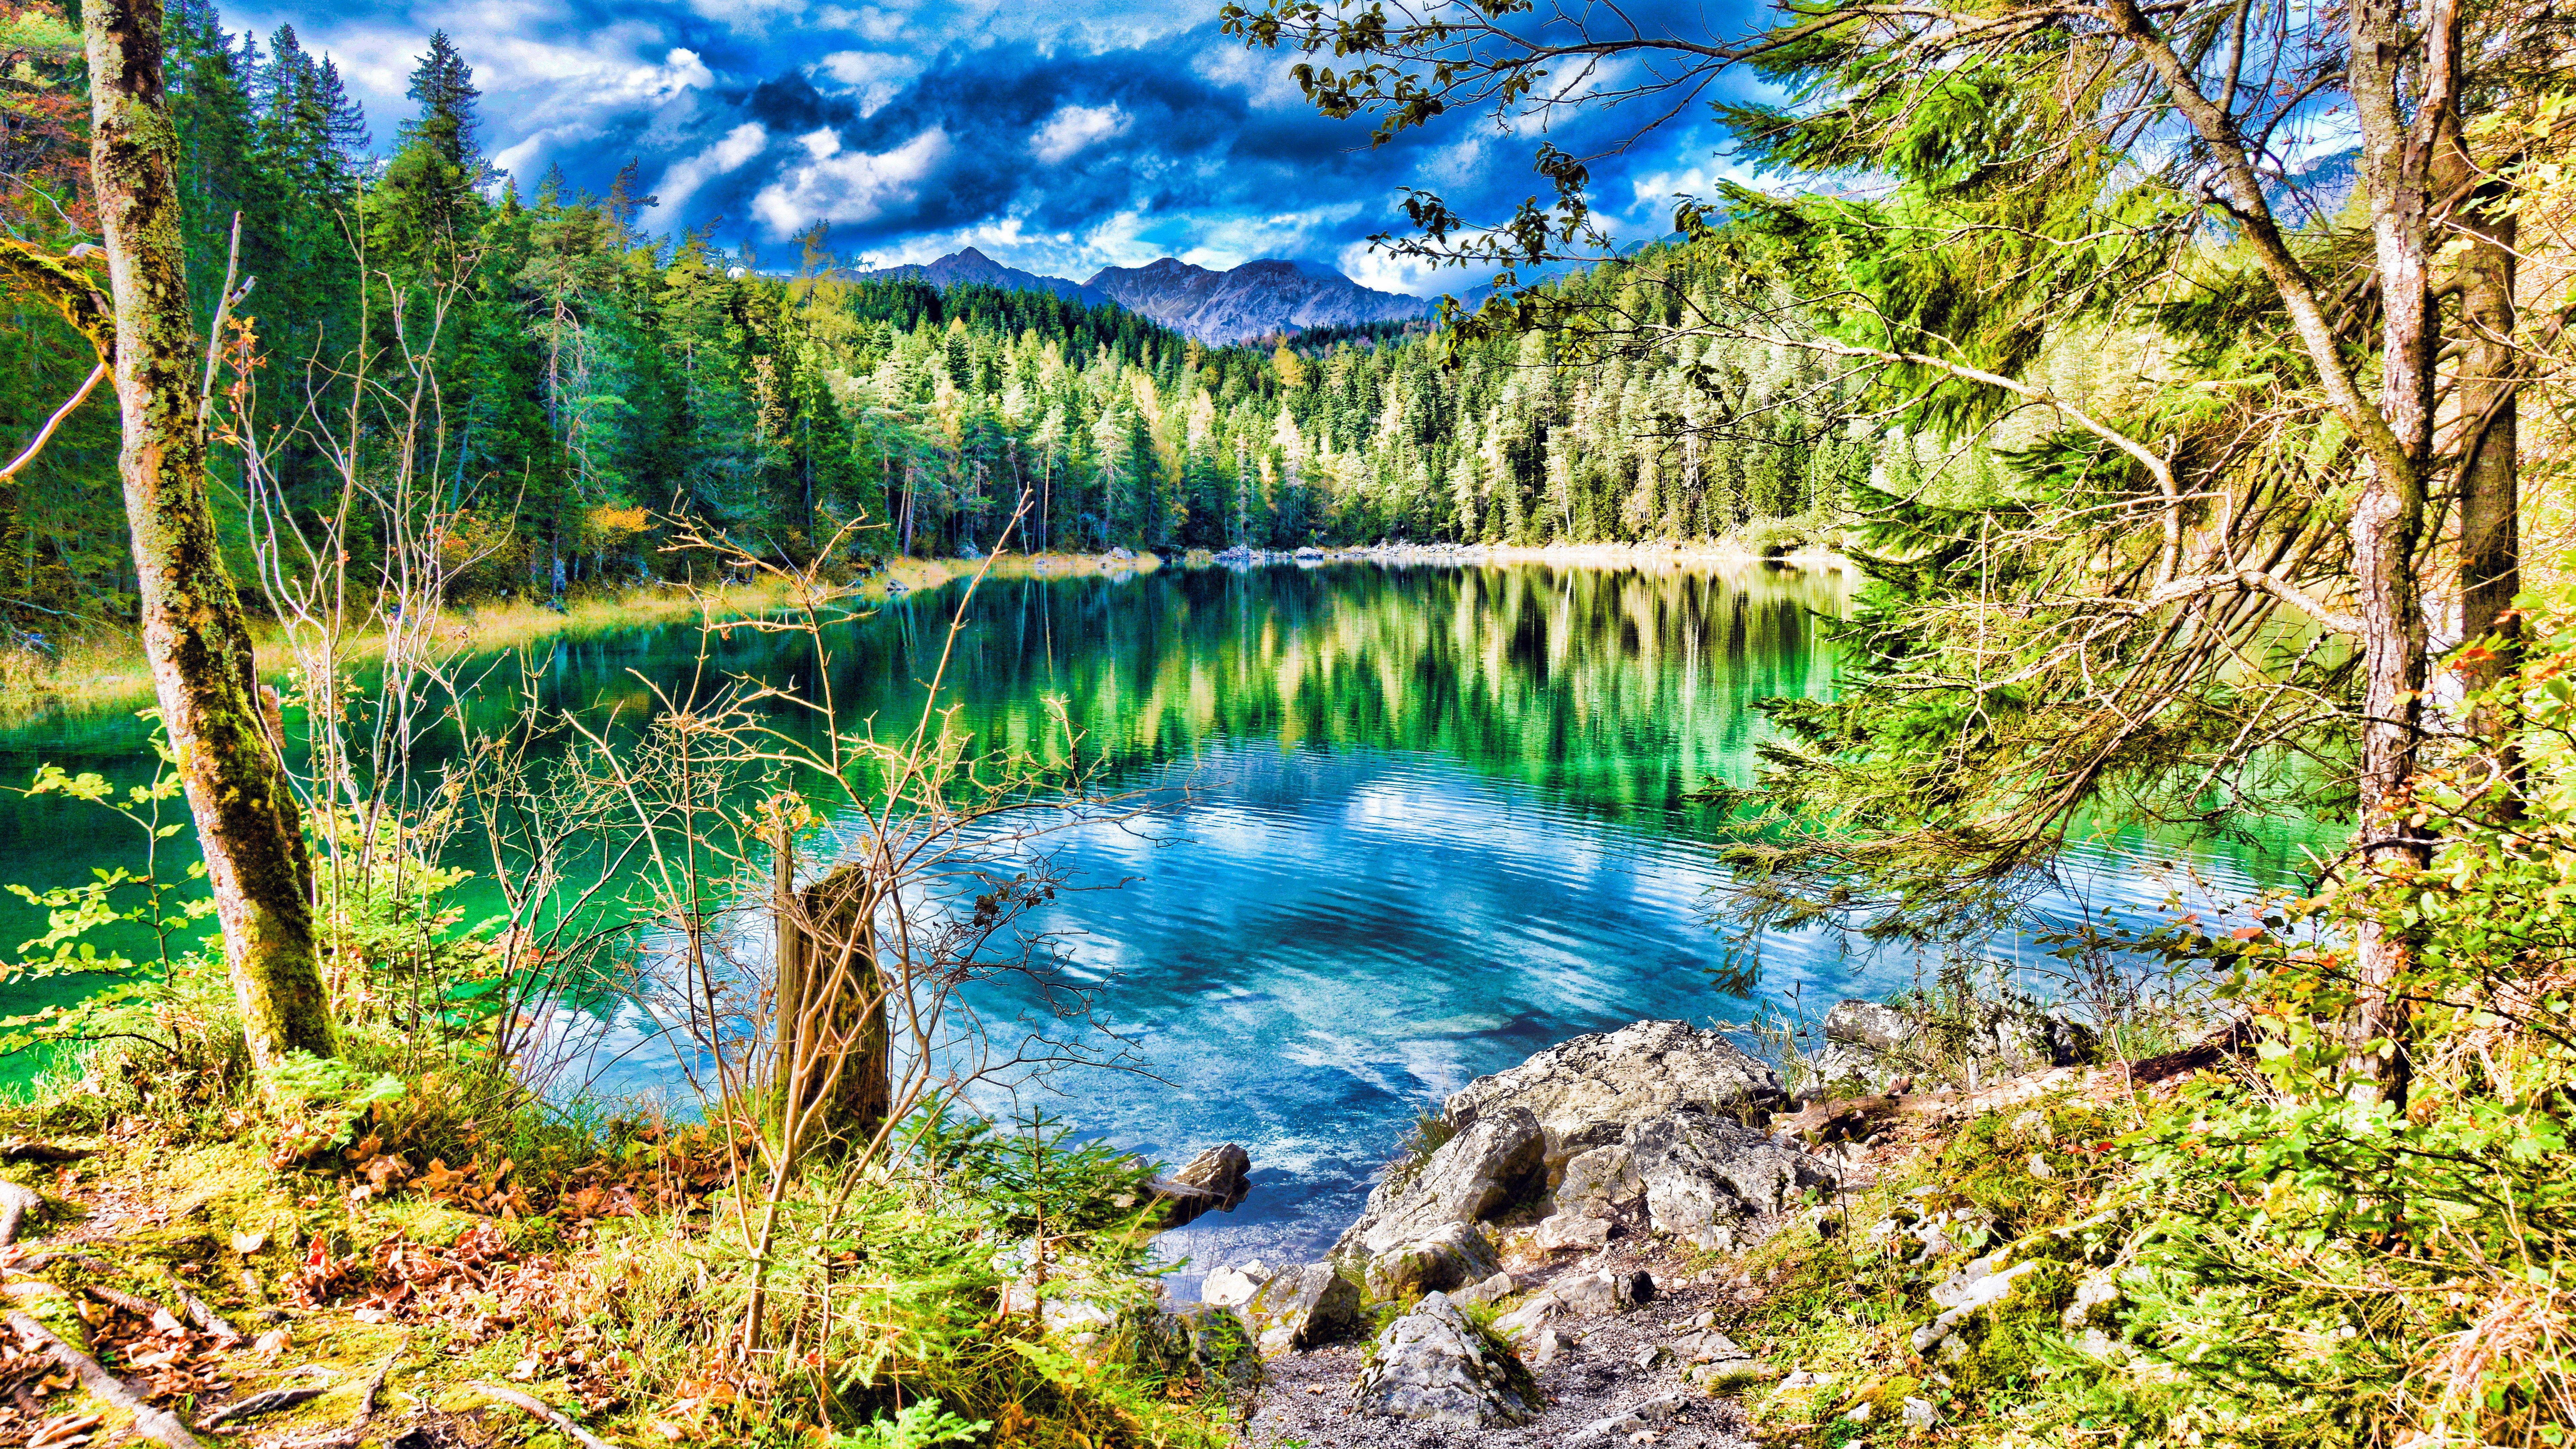 Clear Lake Ultra Hd Wallpaper 8k Resolution 7680x4320 Download